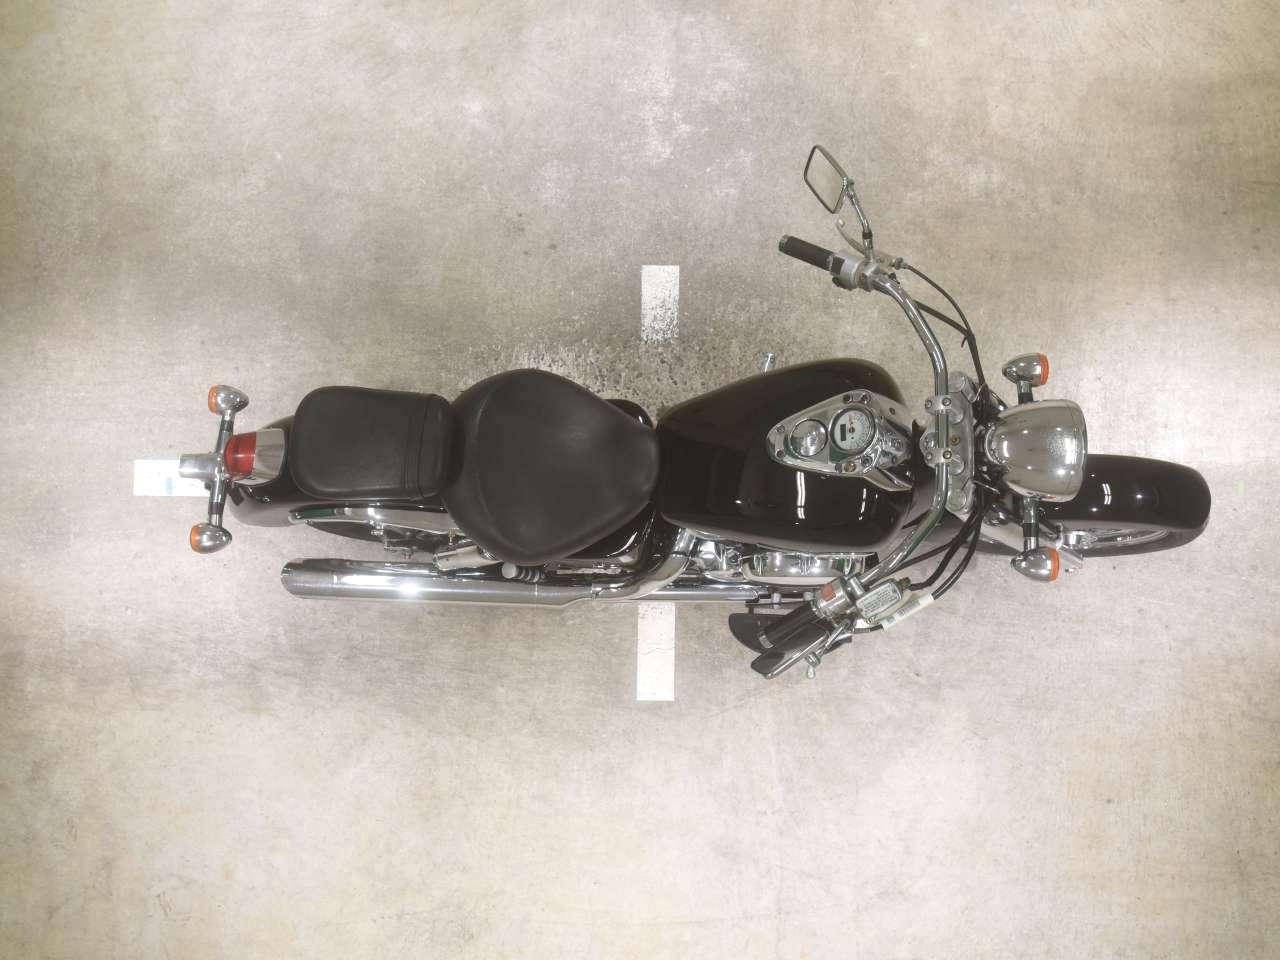 МОТОЦИКЛ HONDA SHADOW 400 2000  Артмото - купить квадроцикл в украине и харькове, мотоцикл, снегоход, скутер, мопед, электромобиль